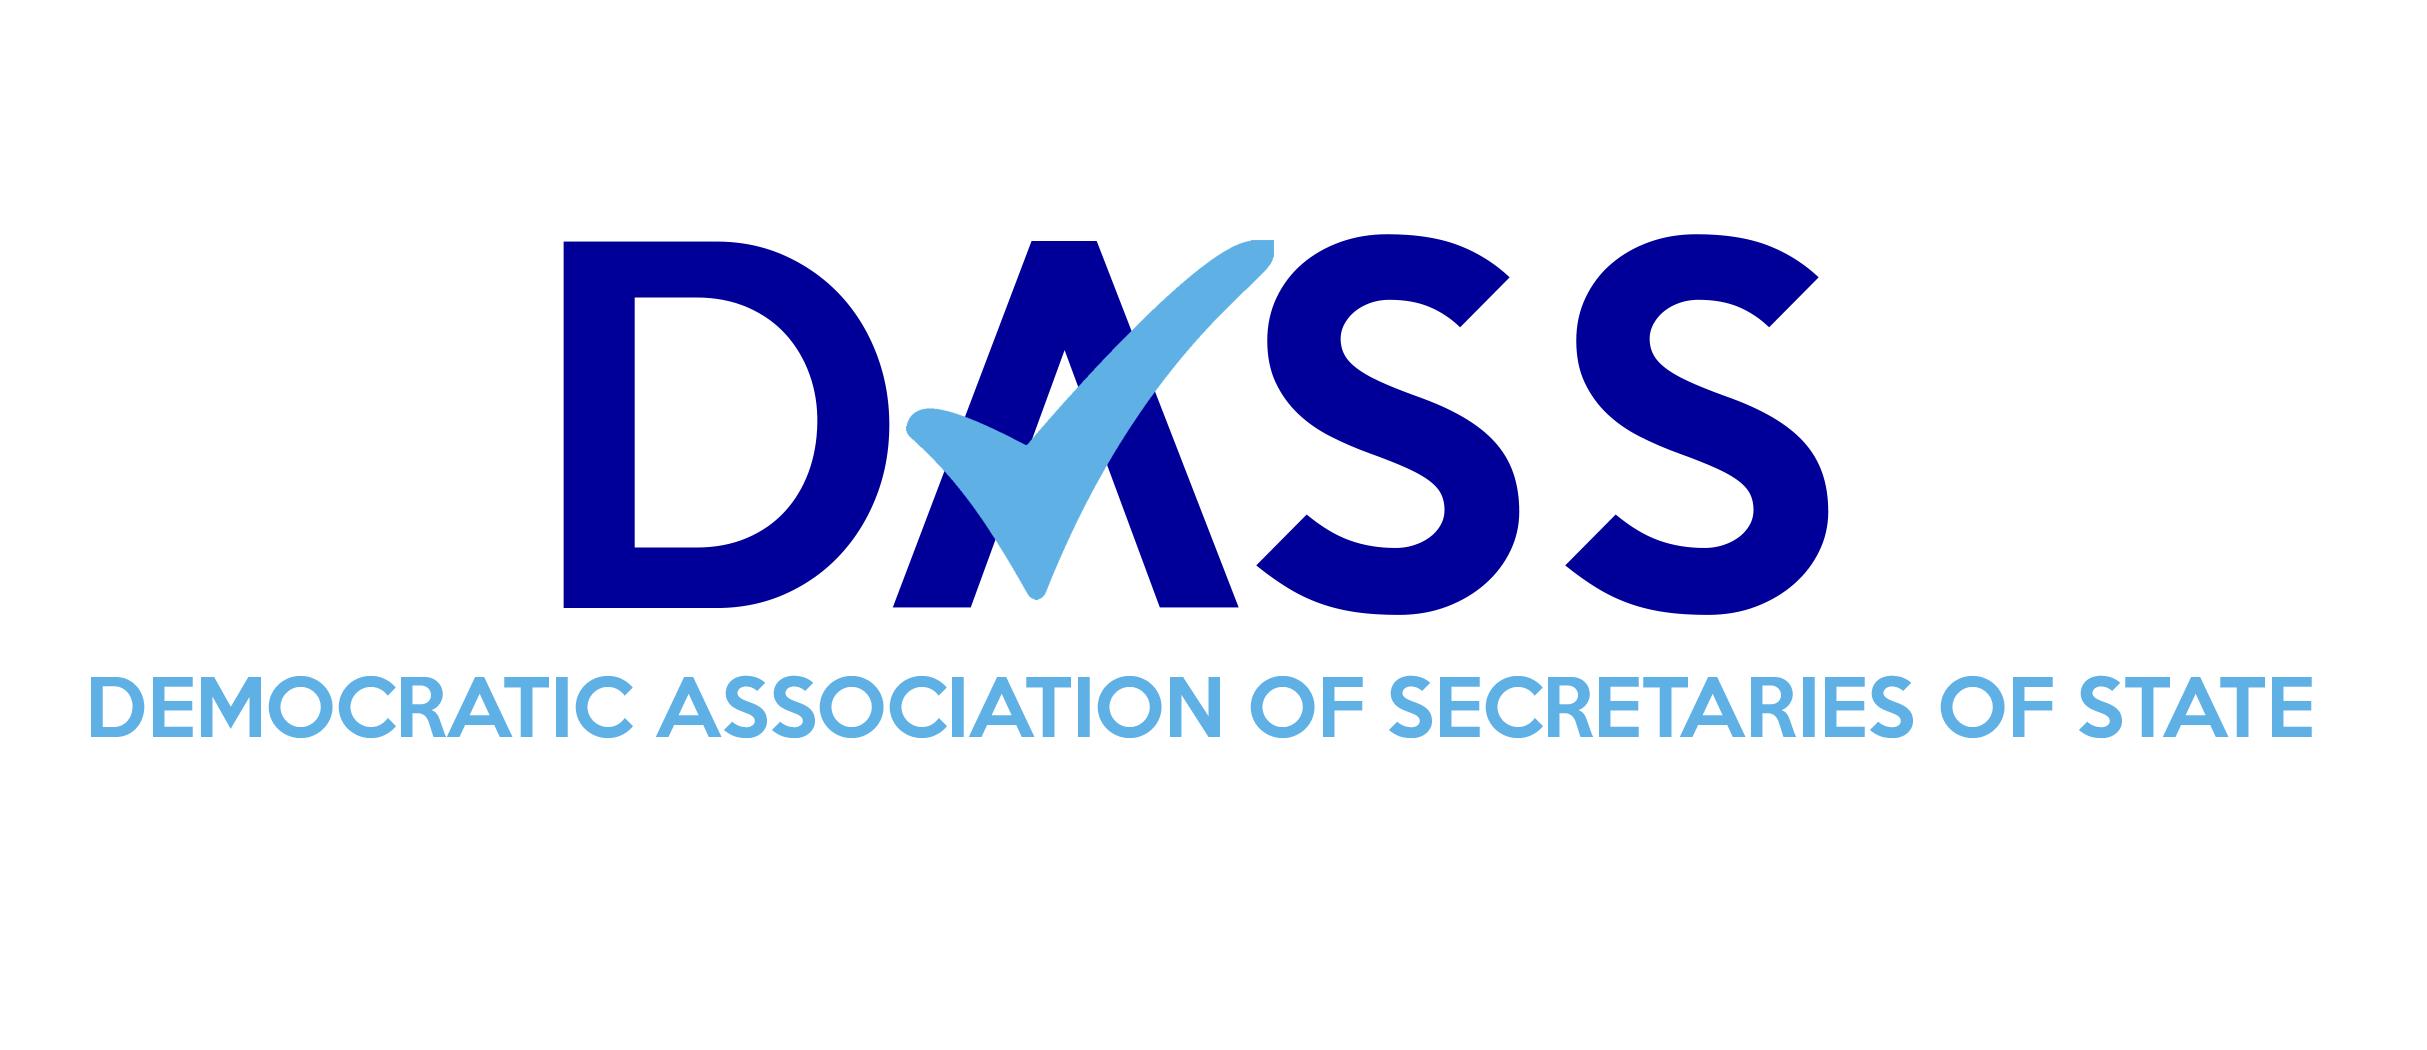 Democratic Association of Secretaries of State